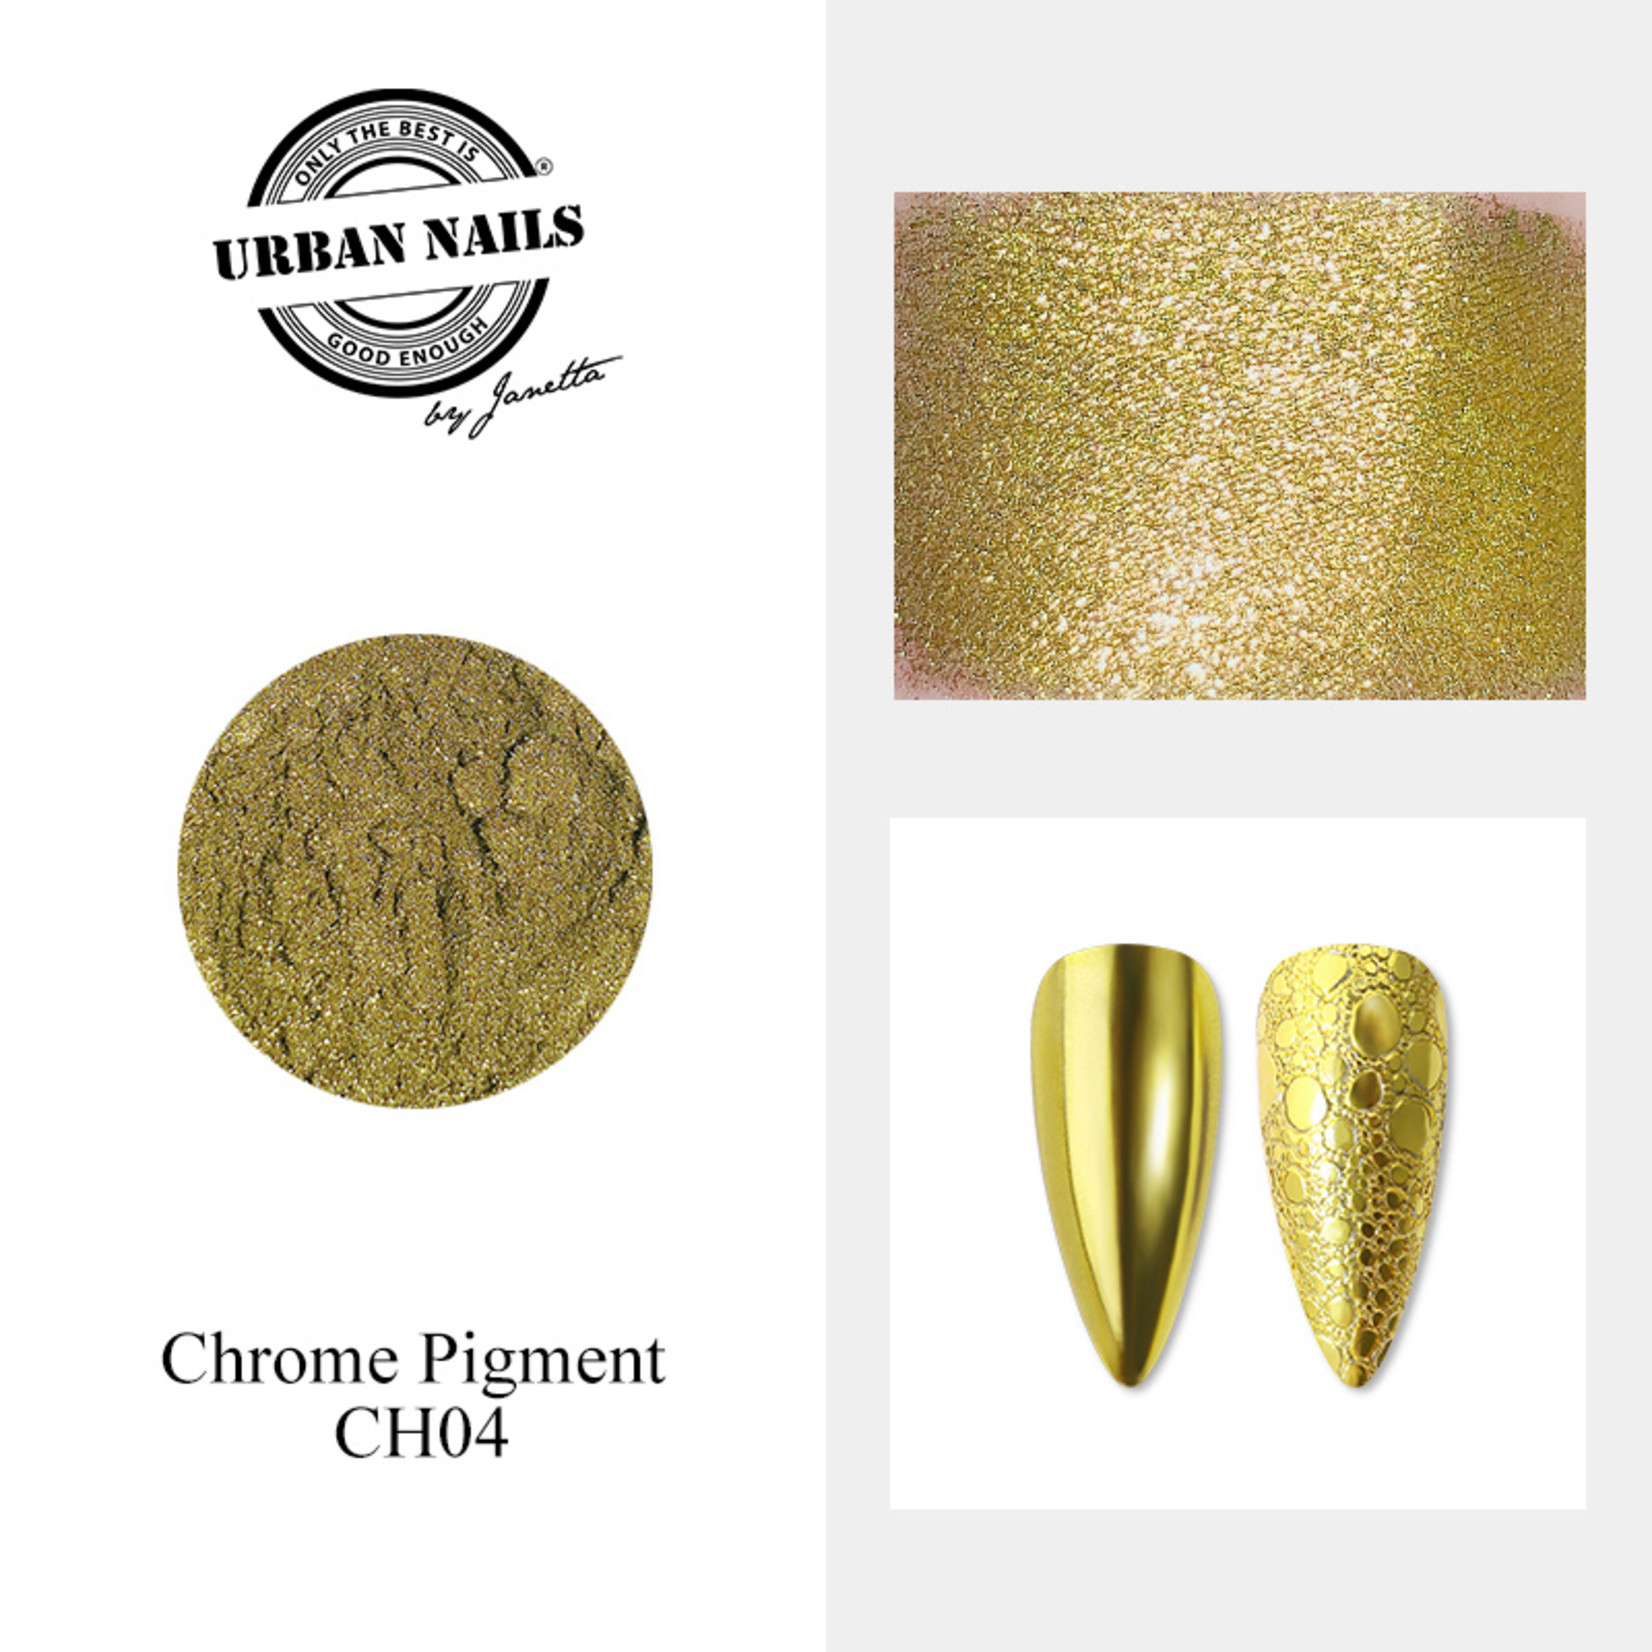 Urban Nails Chrome pigment 04 Geel Goud